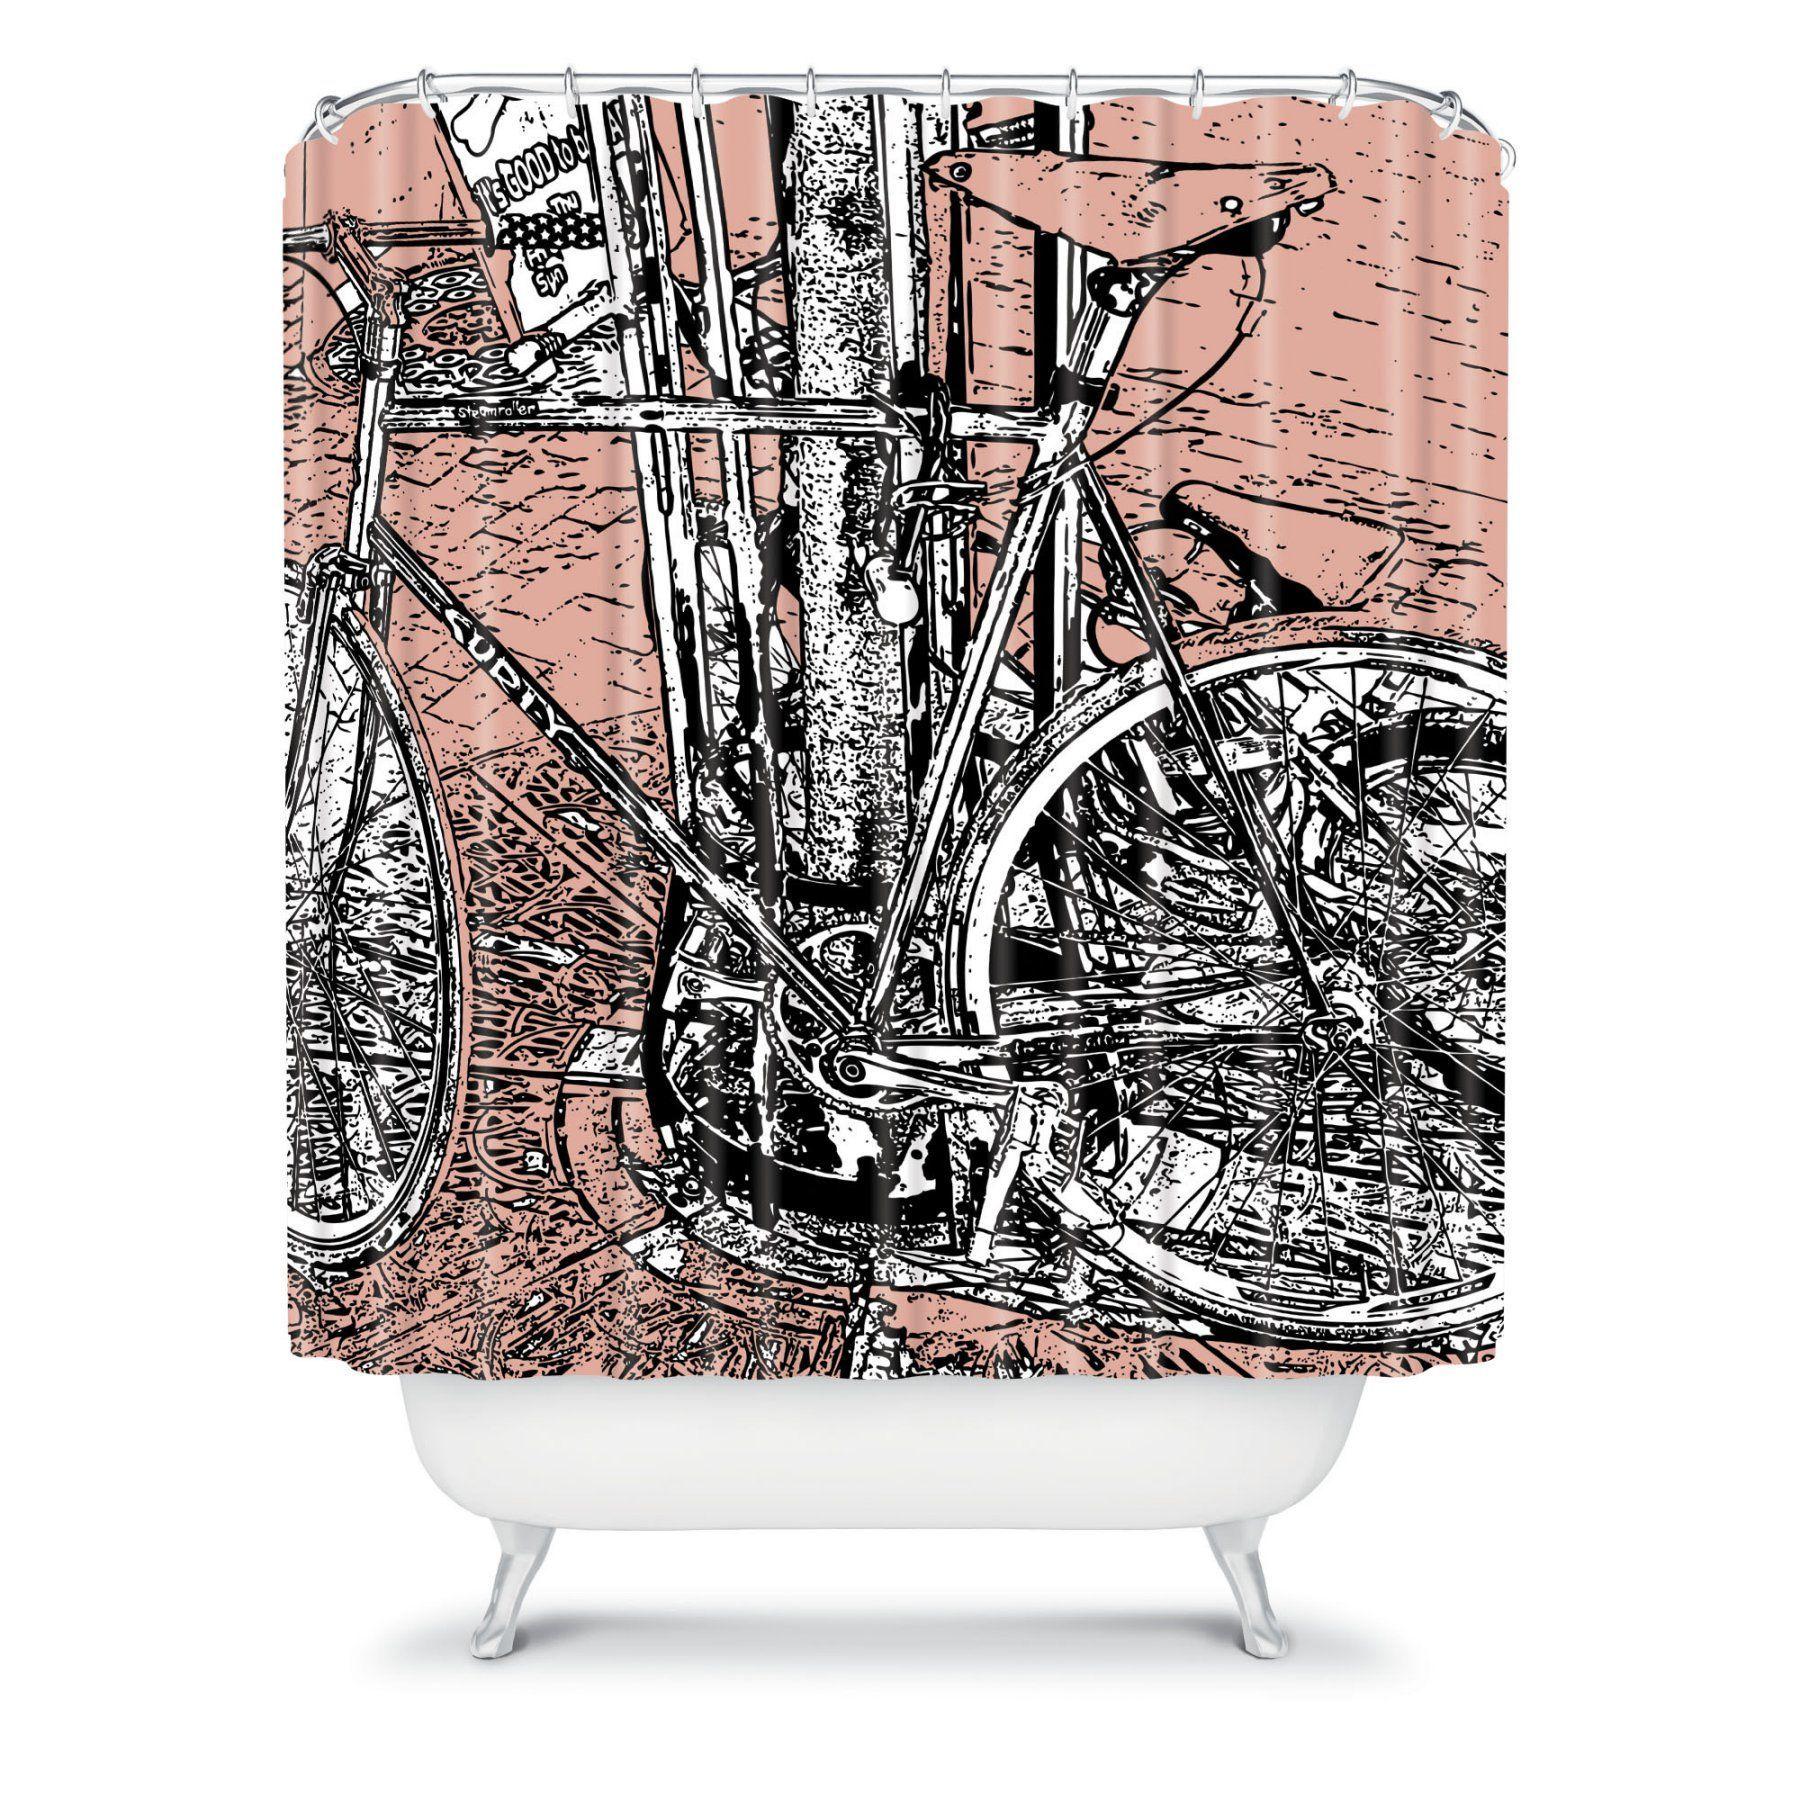 Deny Designs Romi Vega Bike Shower Curtain 13355 Shocur Modern